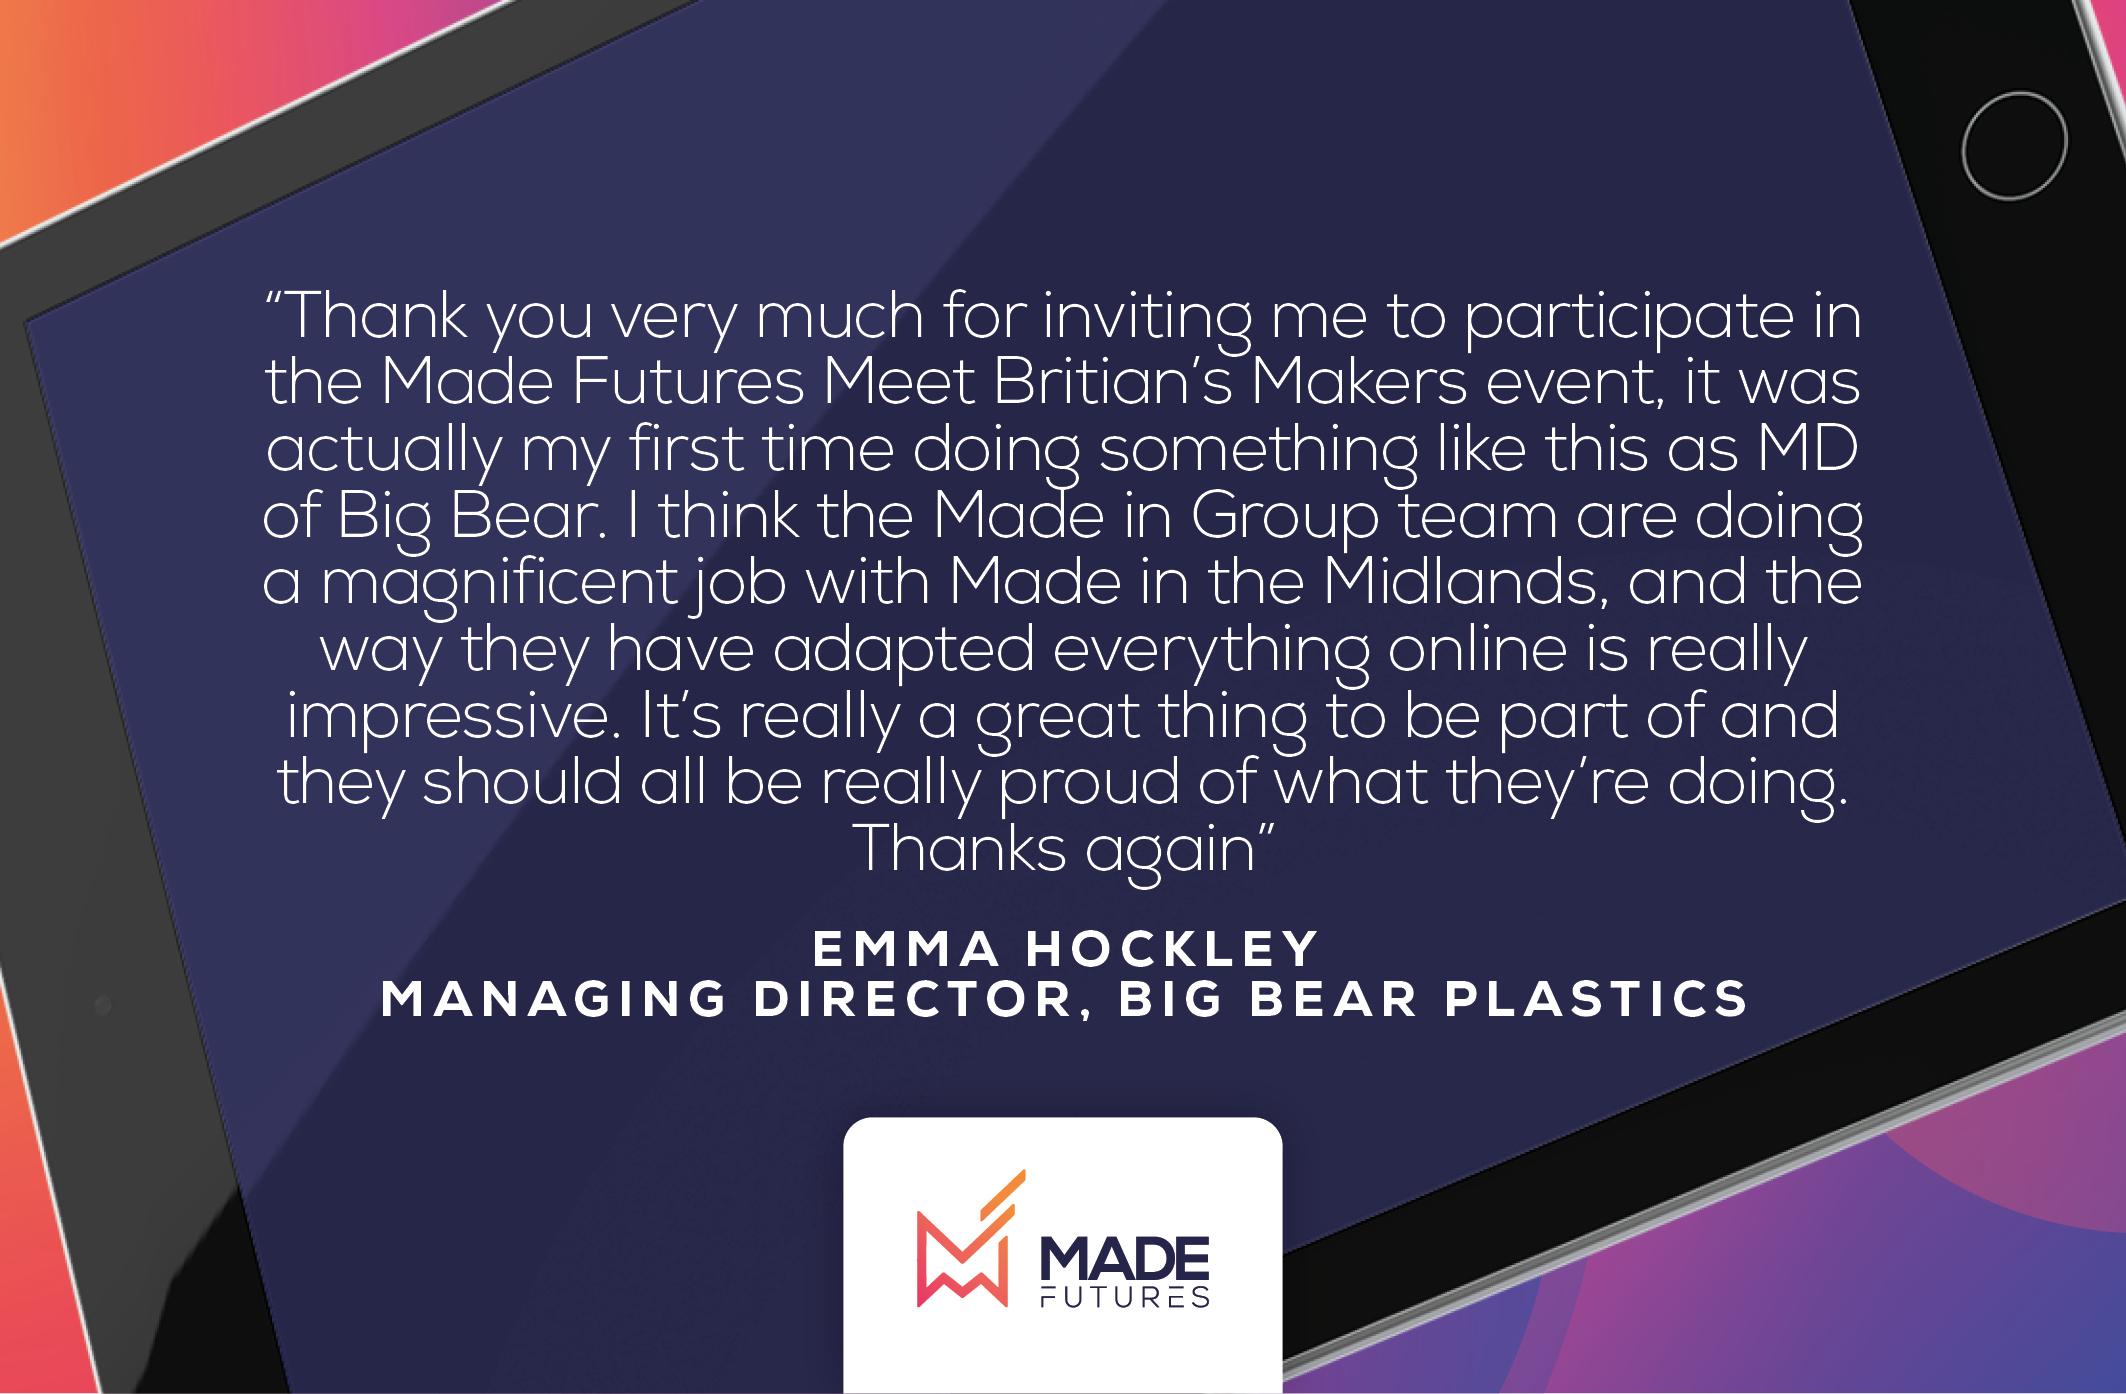 Testimonial by Emma Hockley, Managing director at Big Bear Plastics